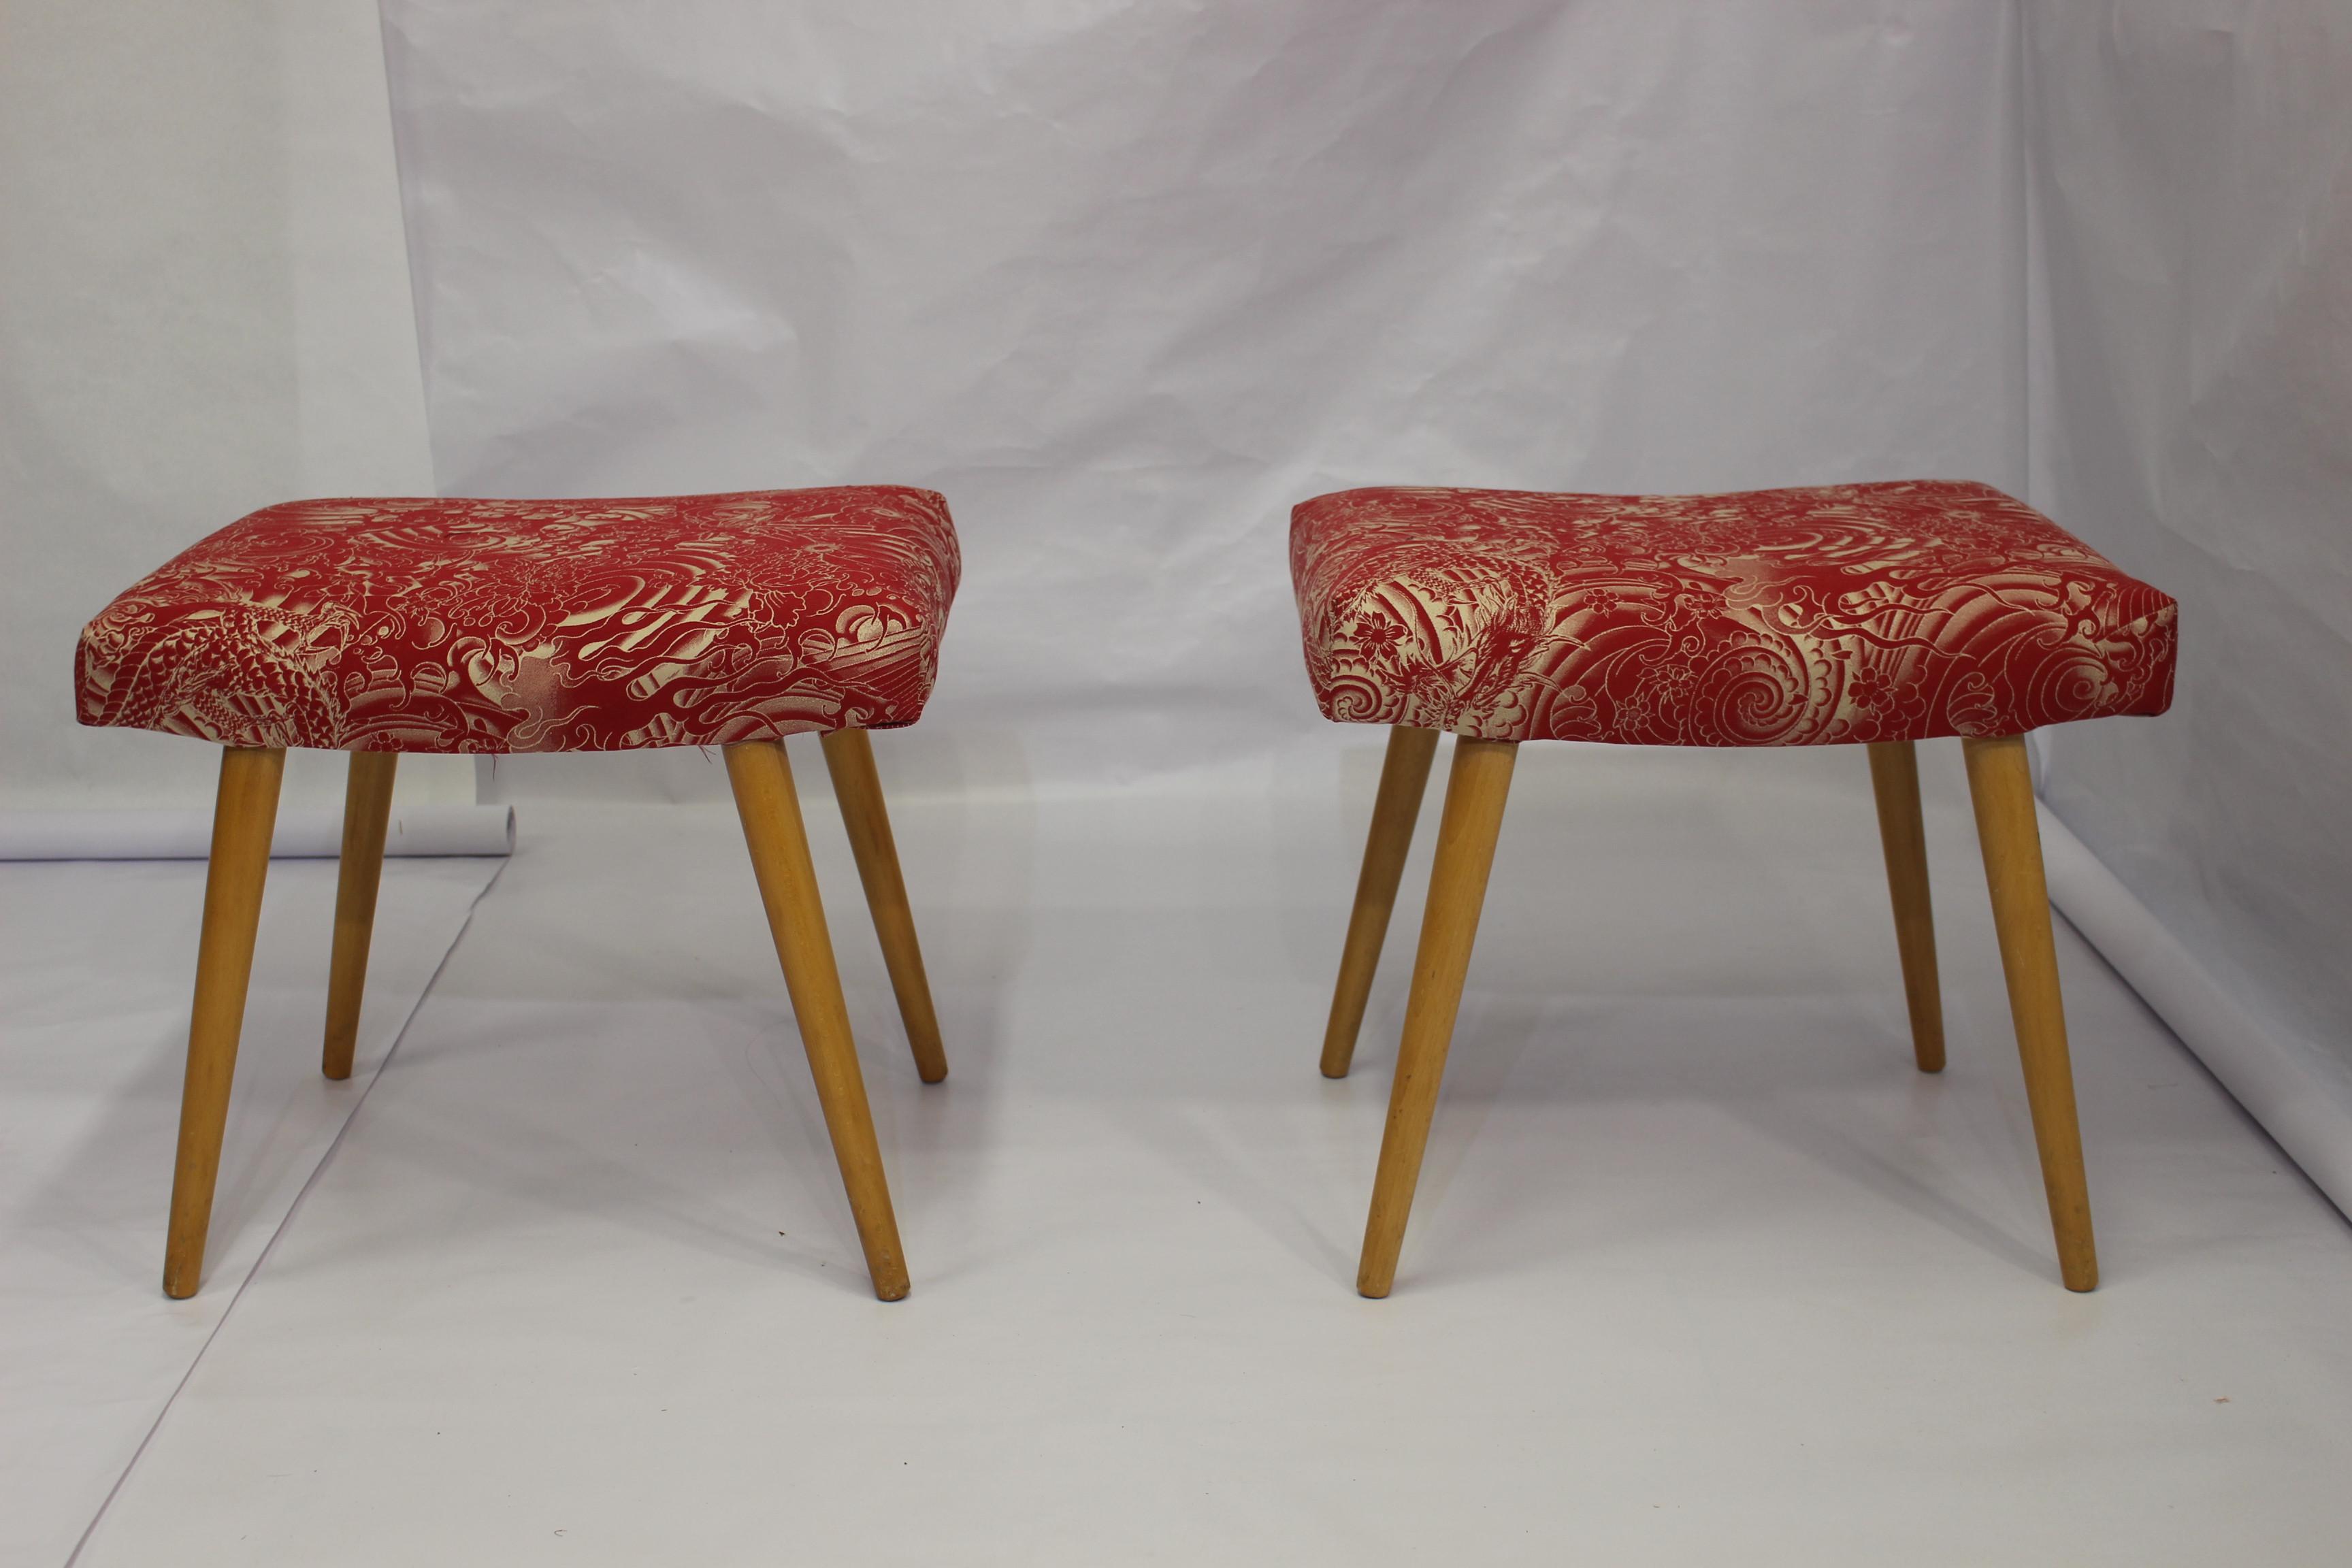 Tissu Jean Paul Gaultier paire de tabourets vintage tissu jean paul gaultier